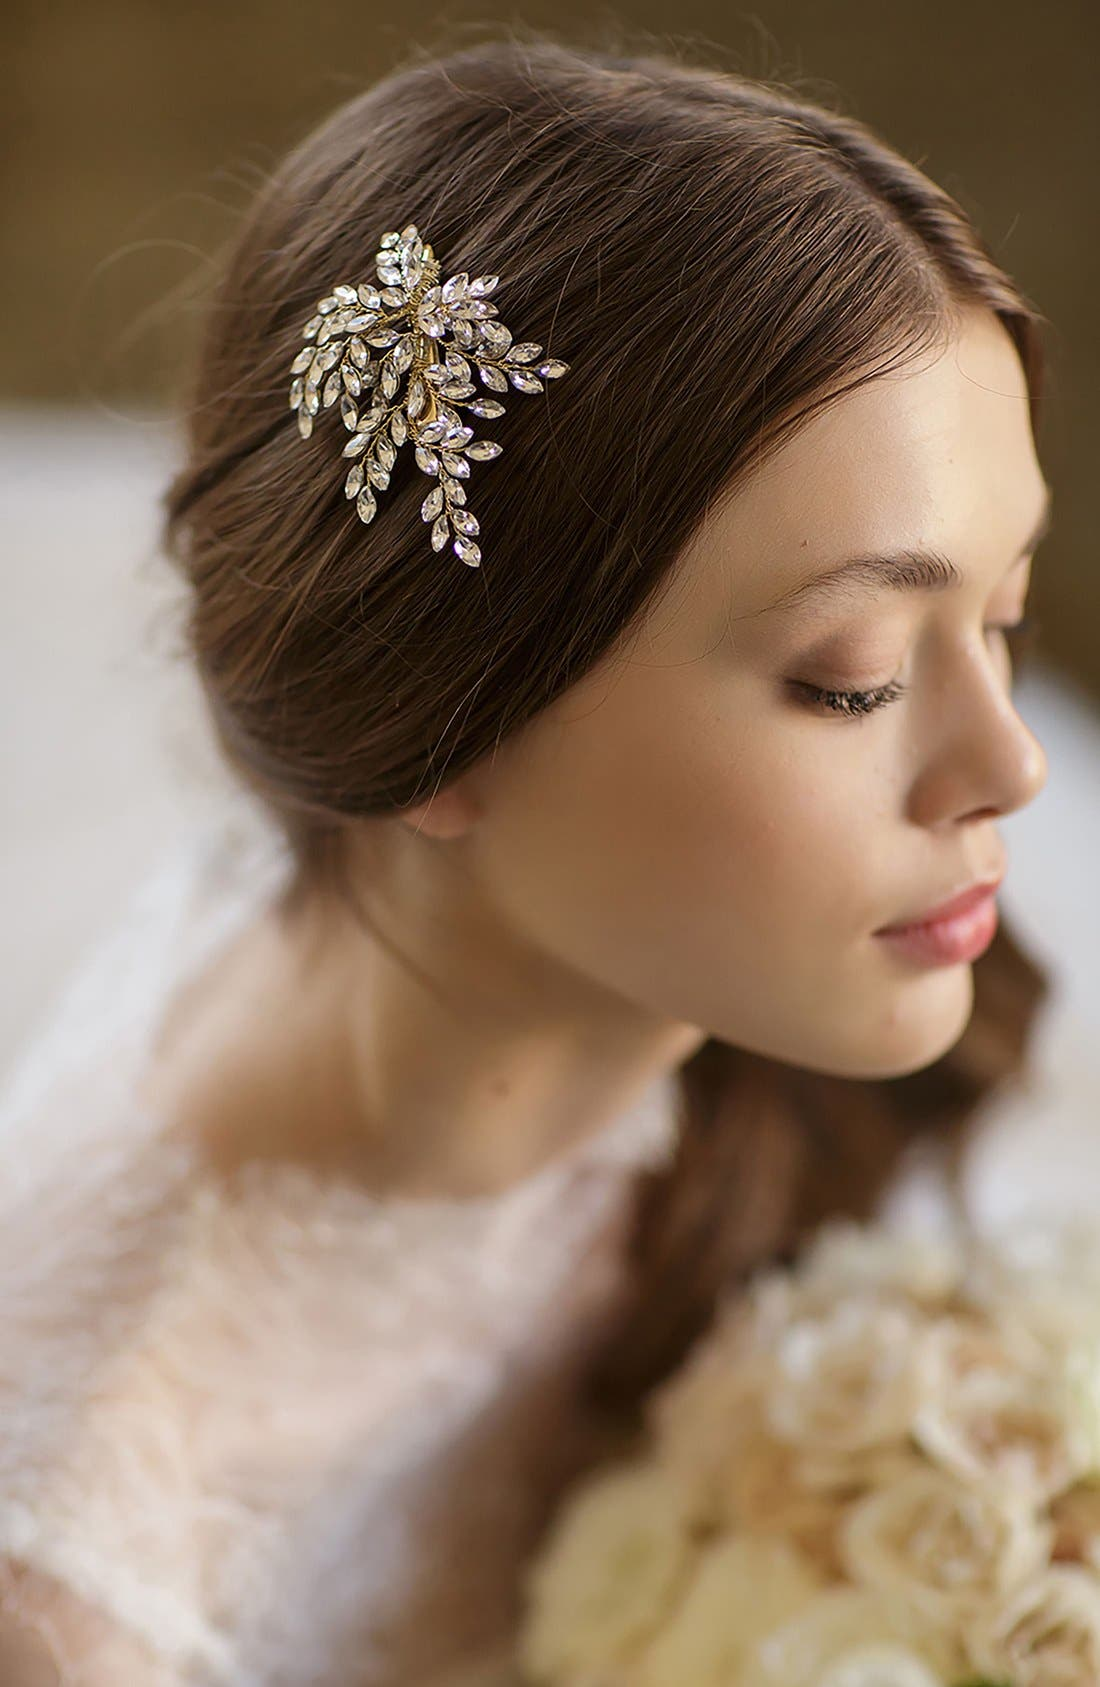 Brides & Hairpins 'Sahara' Crystal Leaf Bendable Hair Clip